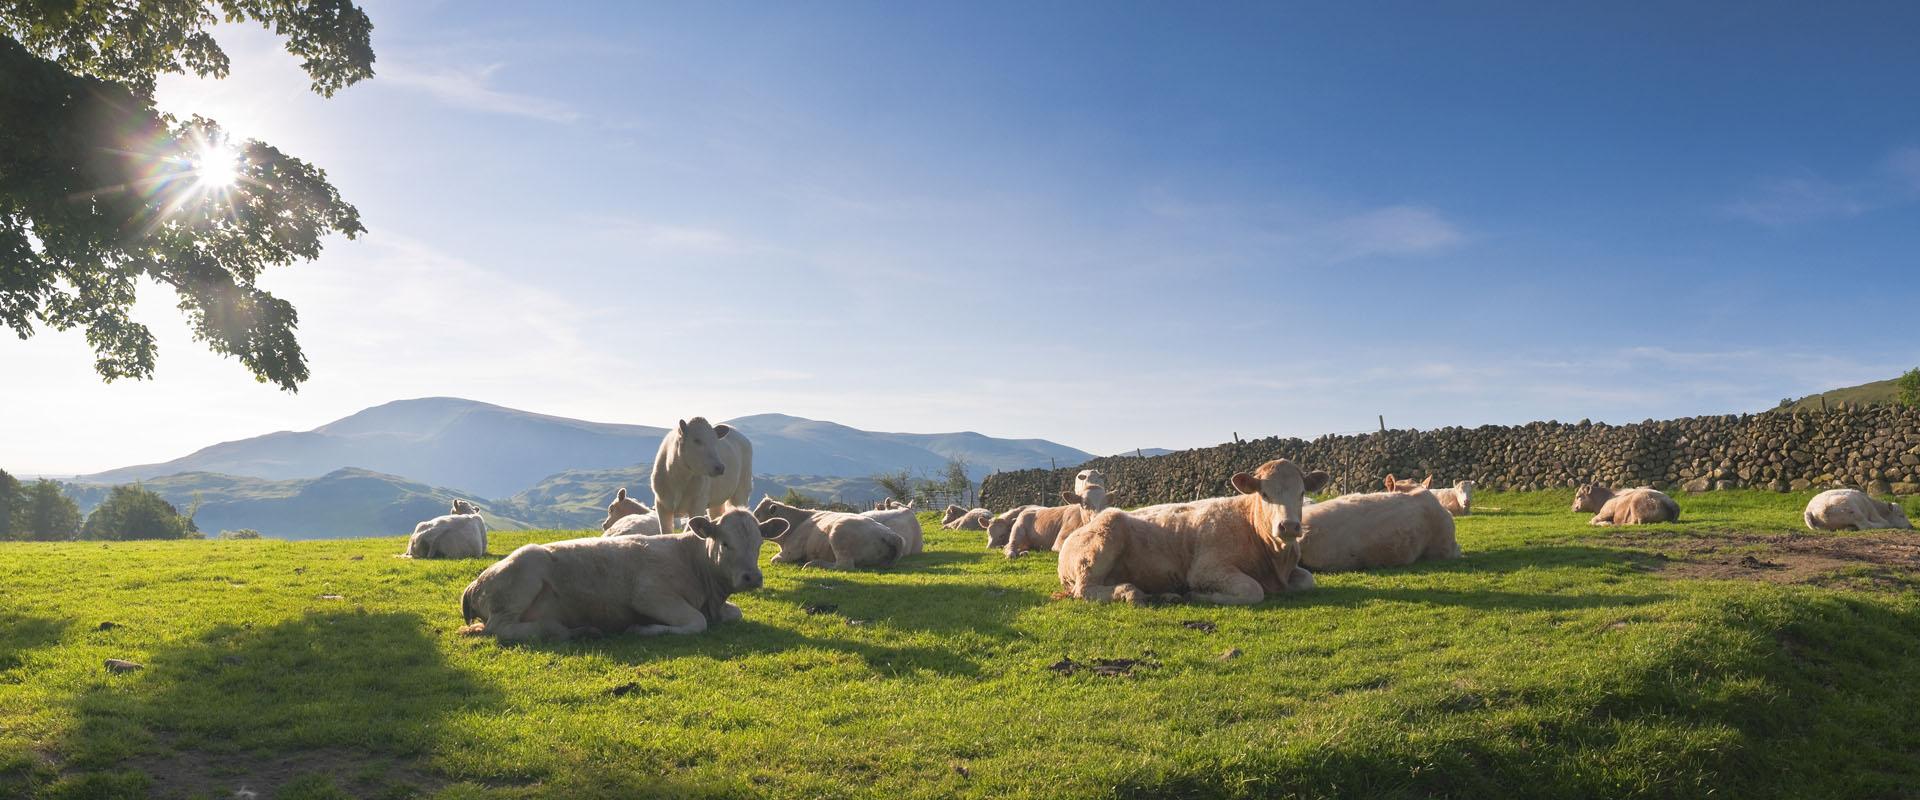 Kuhherde auf einem Feld